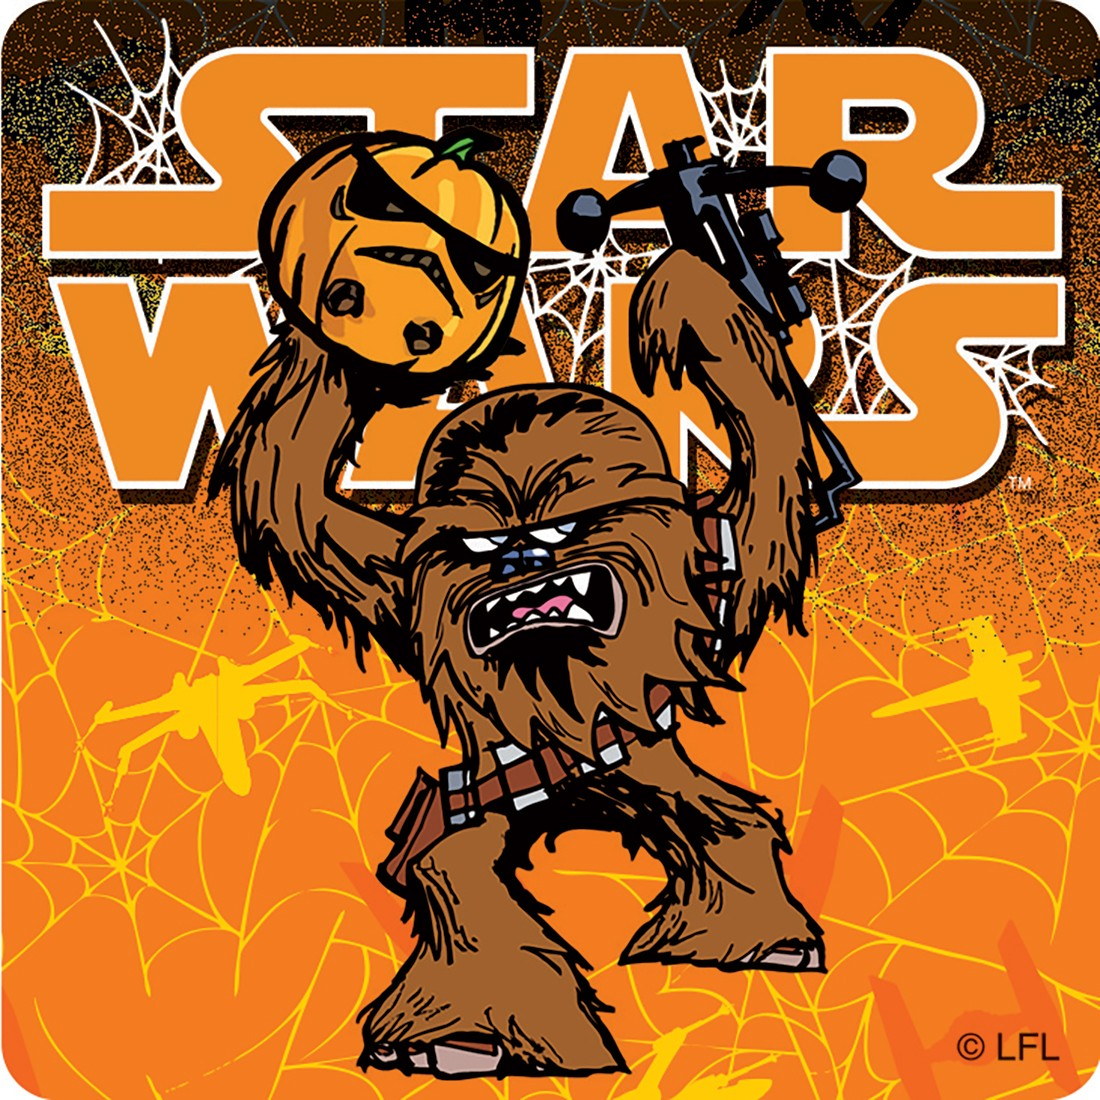 Clip art star wars. Starwars clipart halloween